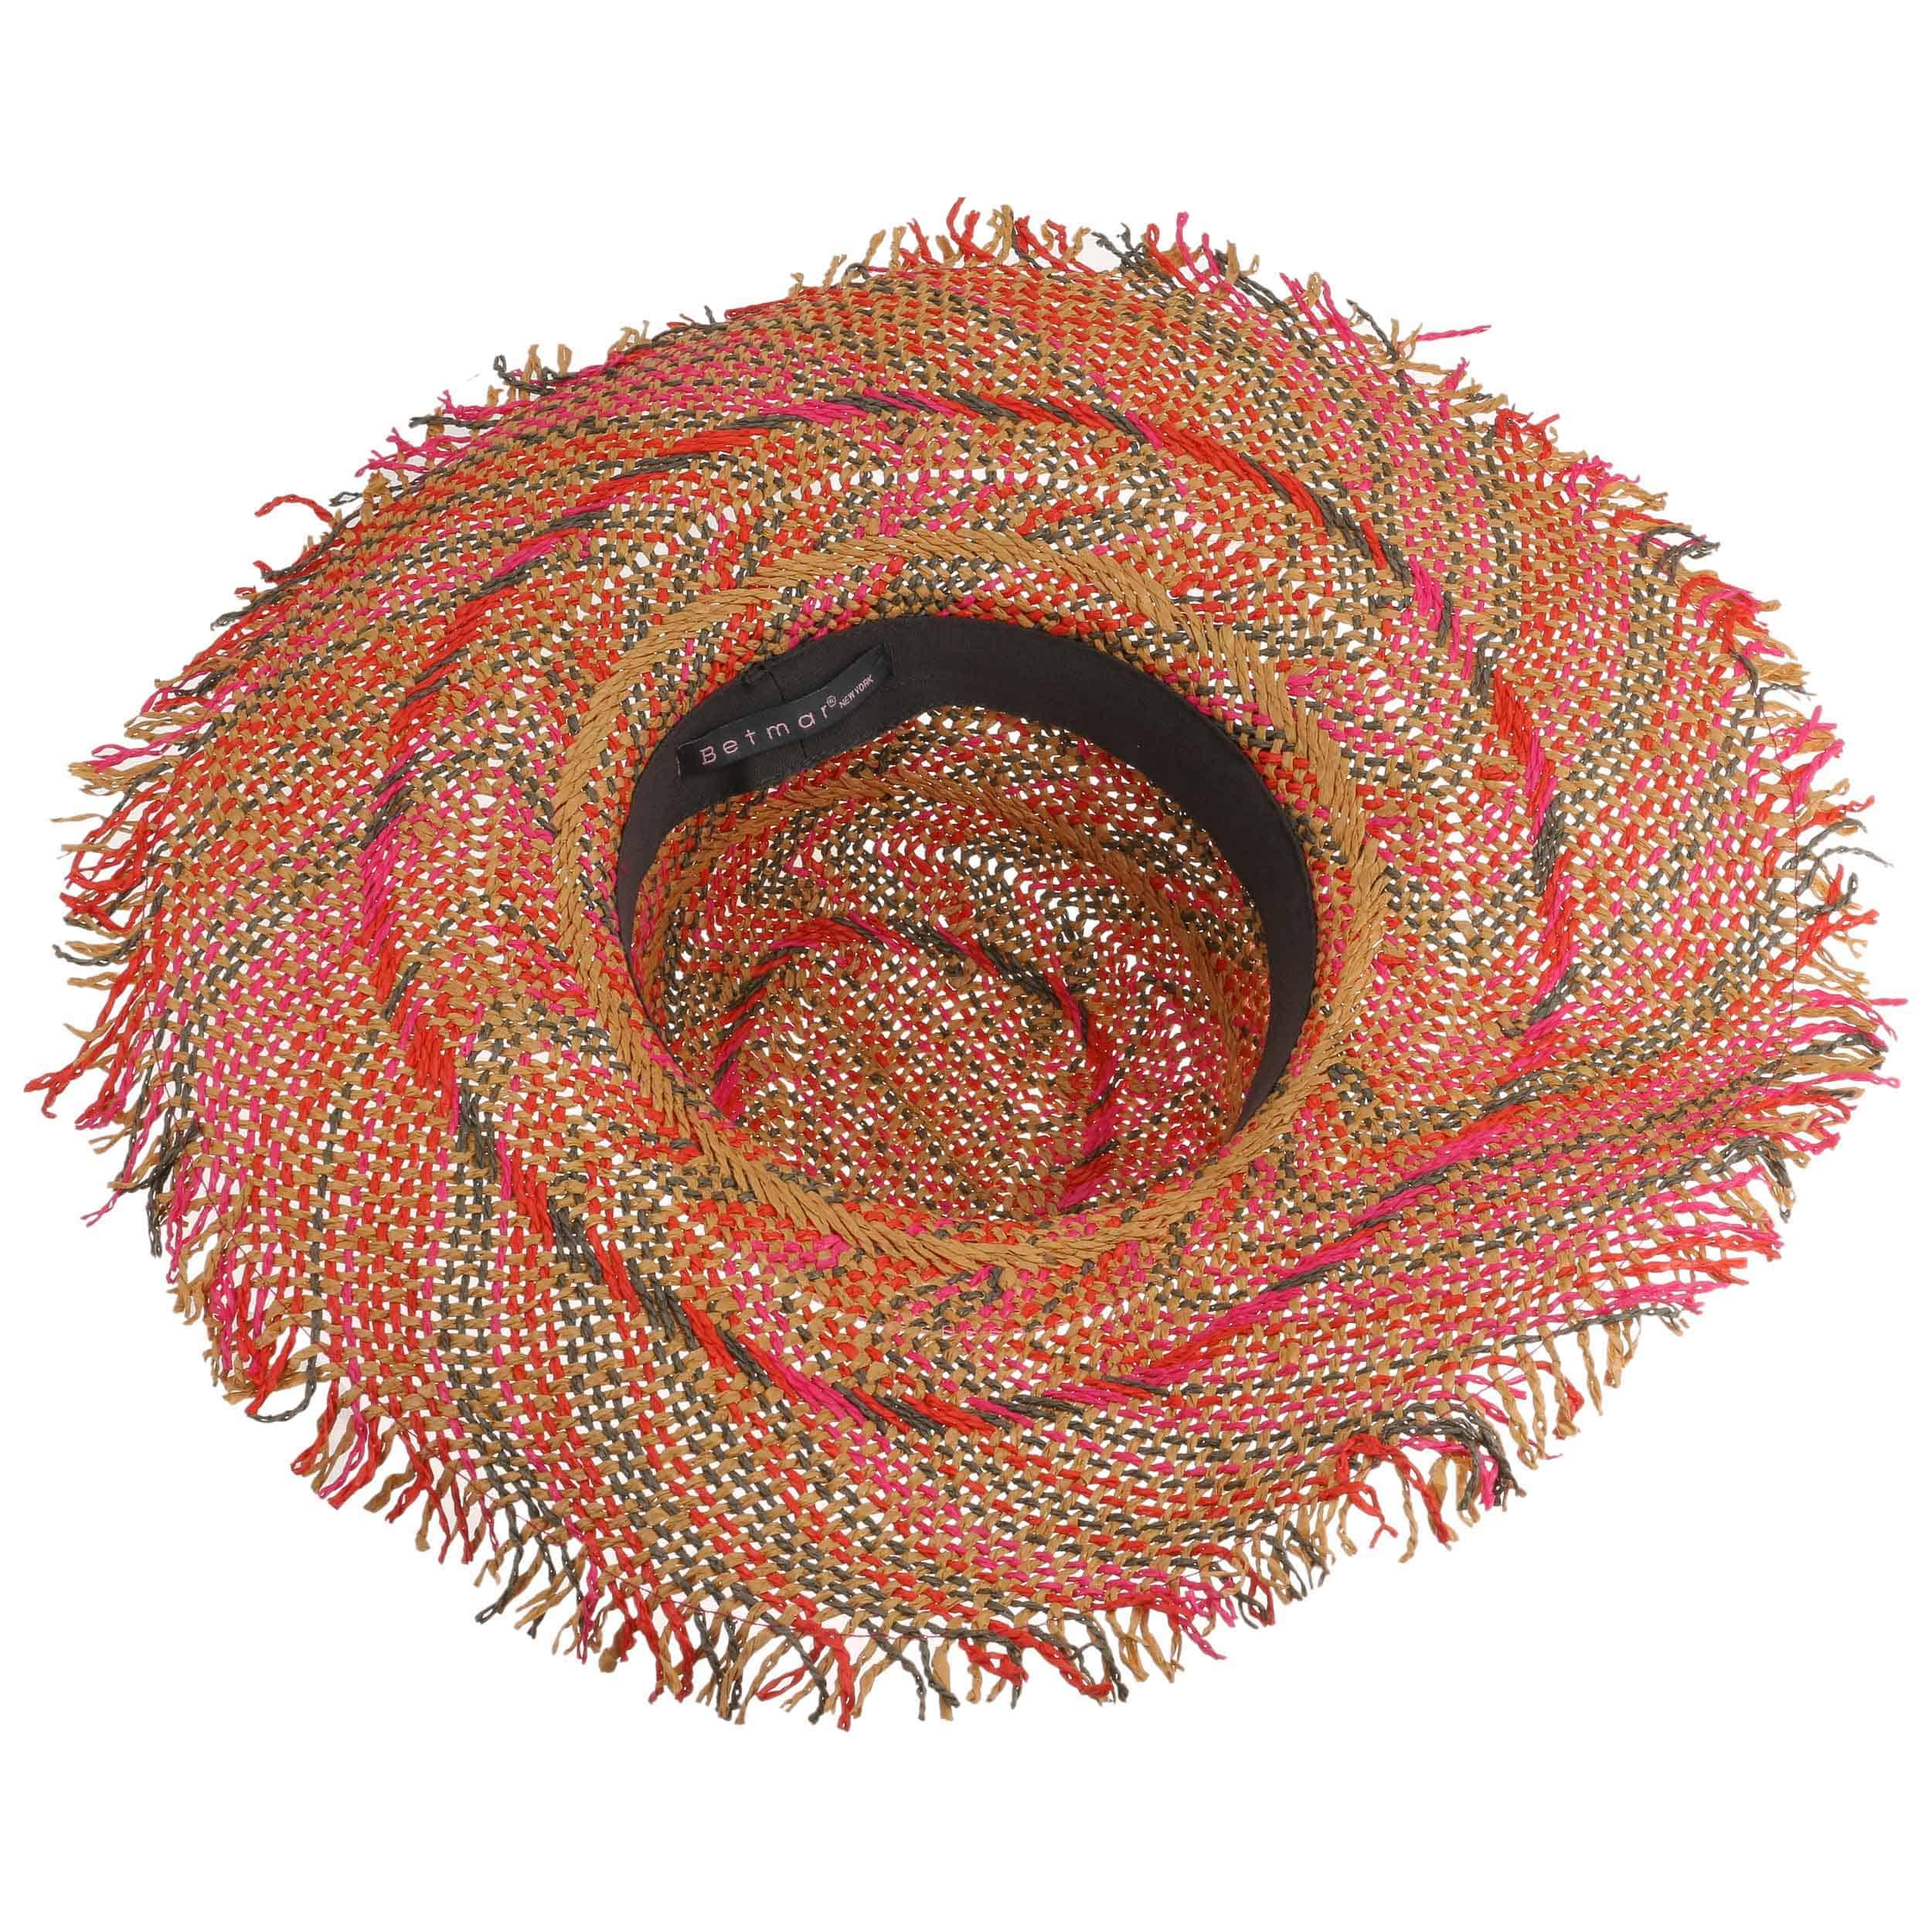 9a927bca ... Tulum Floppy Hat by Betmar - mixed colours 2 ...